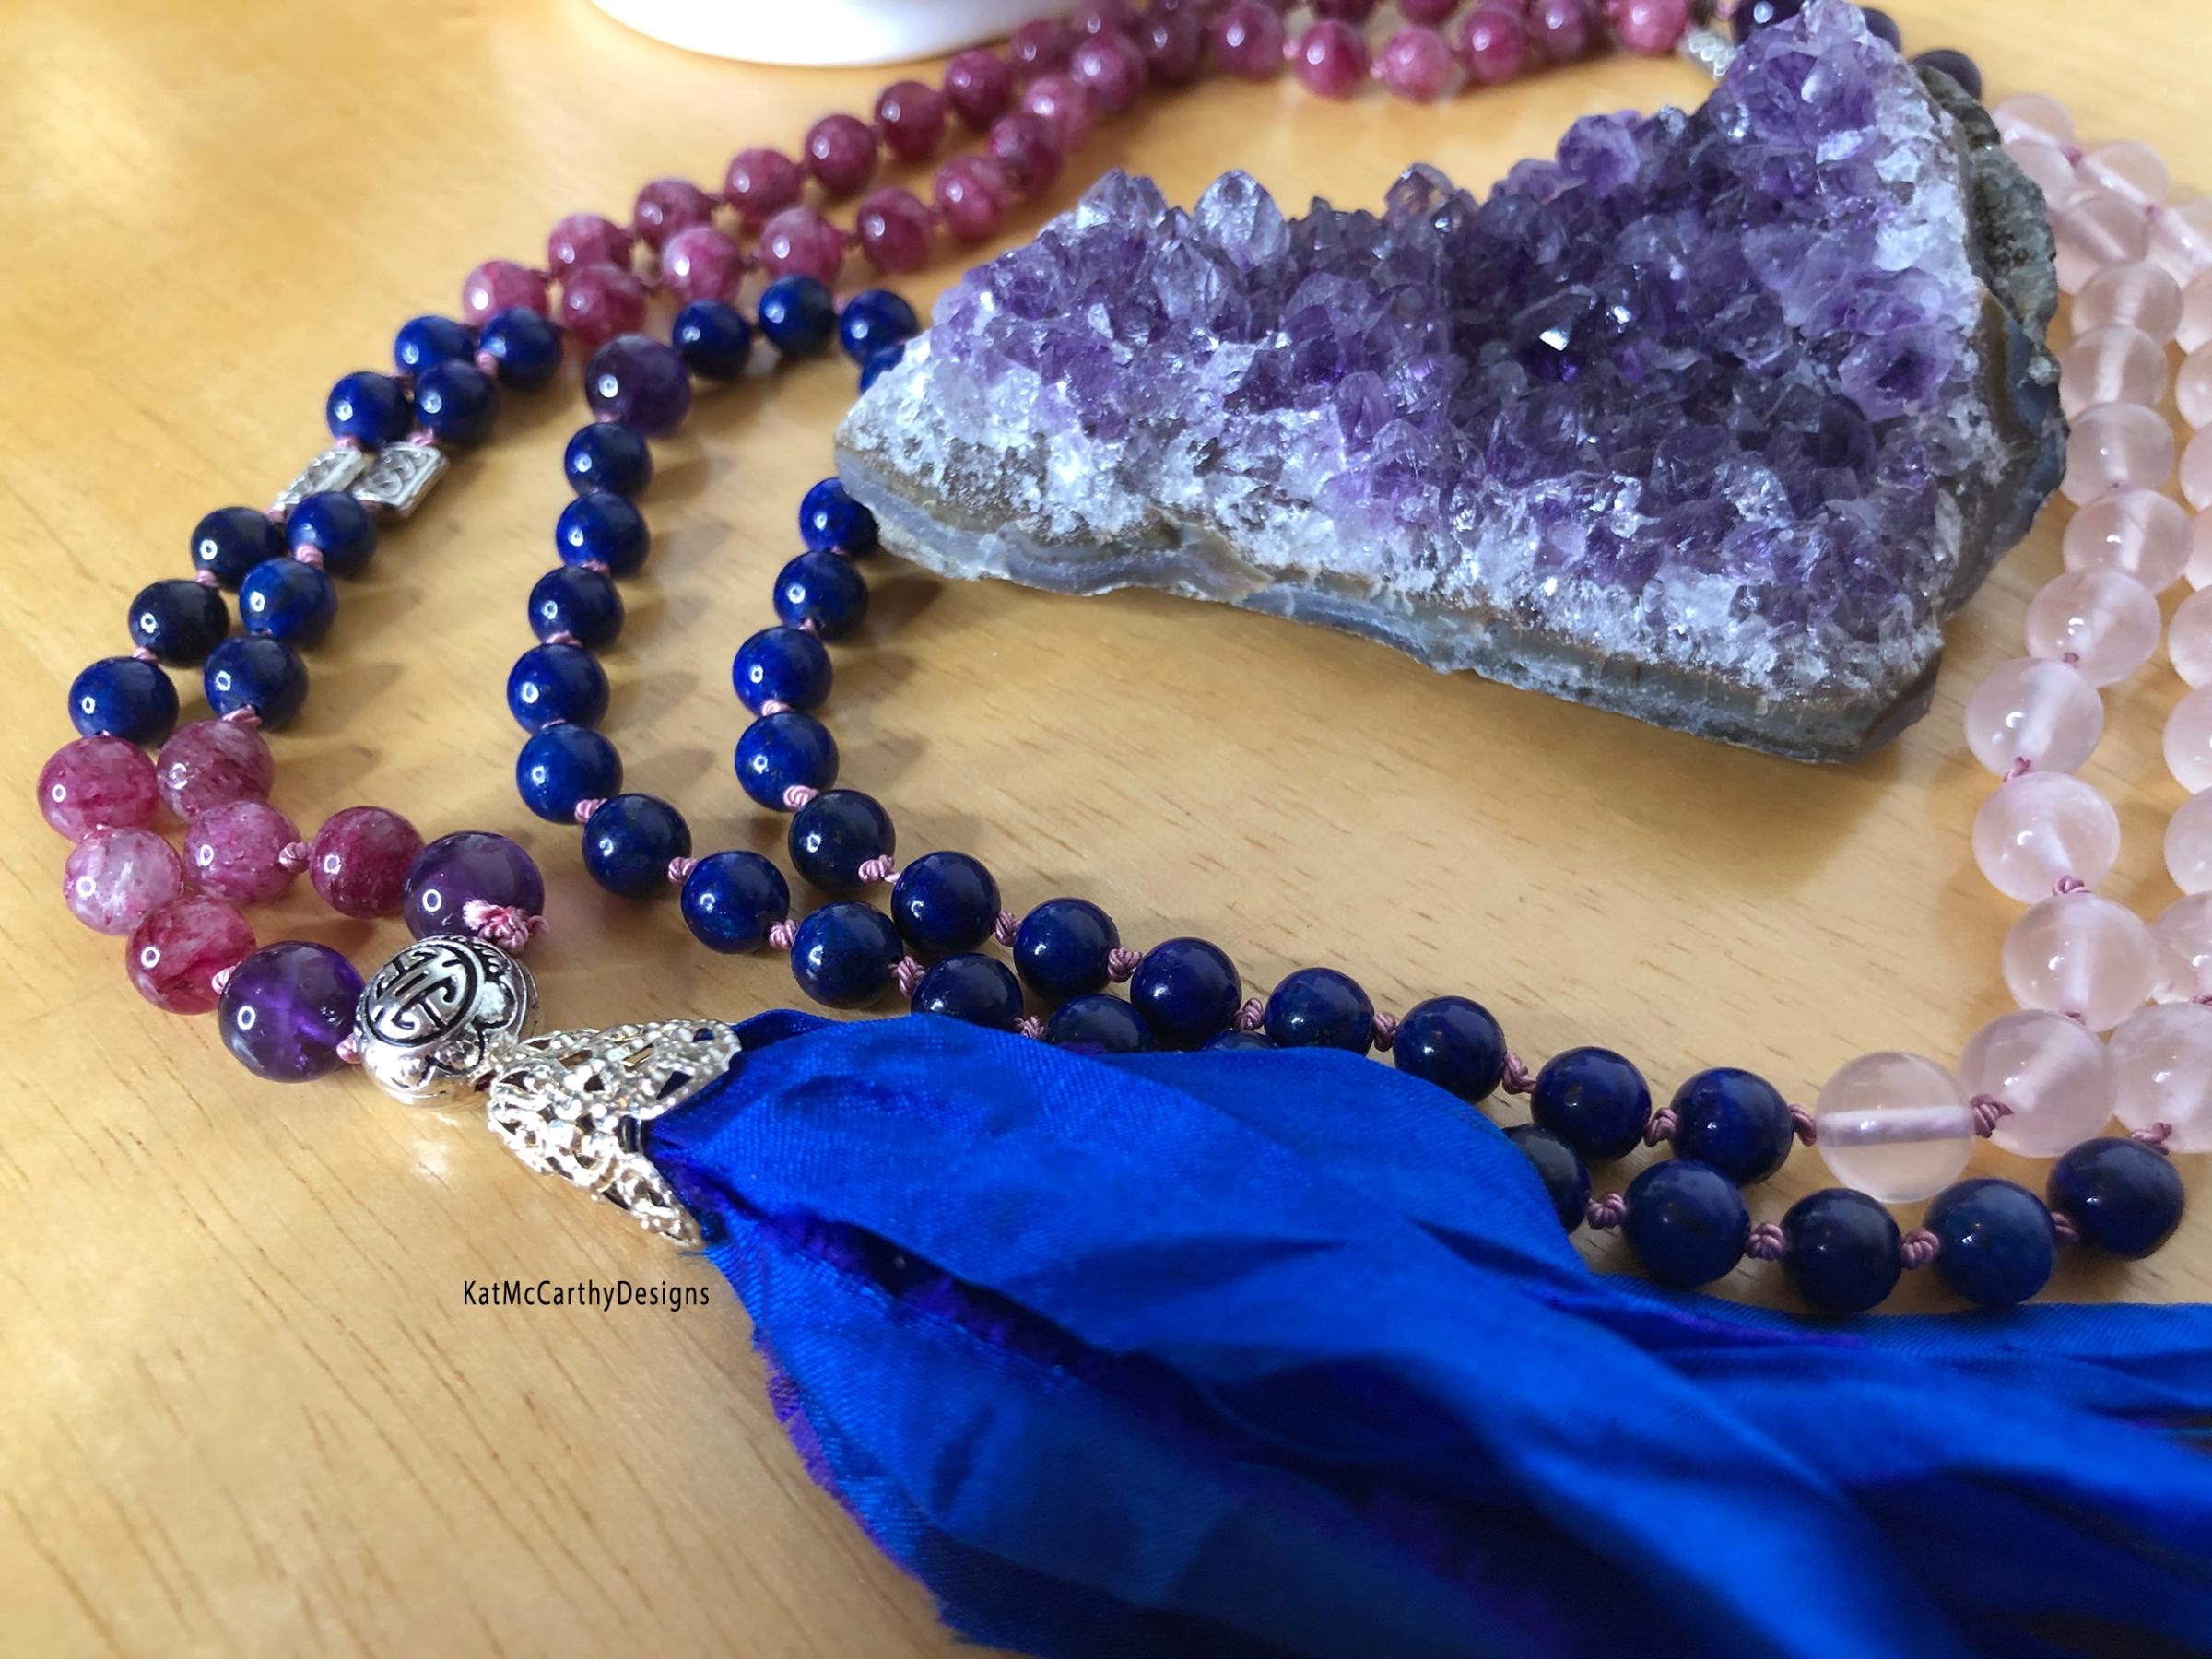 108 tibetan buddhist zen prayer bead gemstone crystal mala on silk cord with silk tassel for meditation or mantras